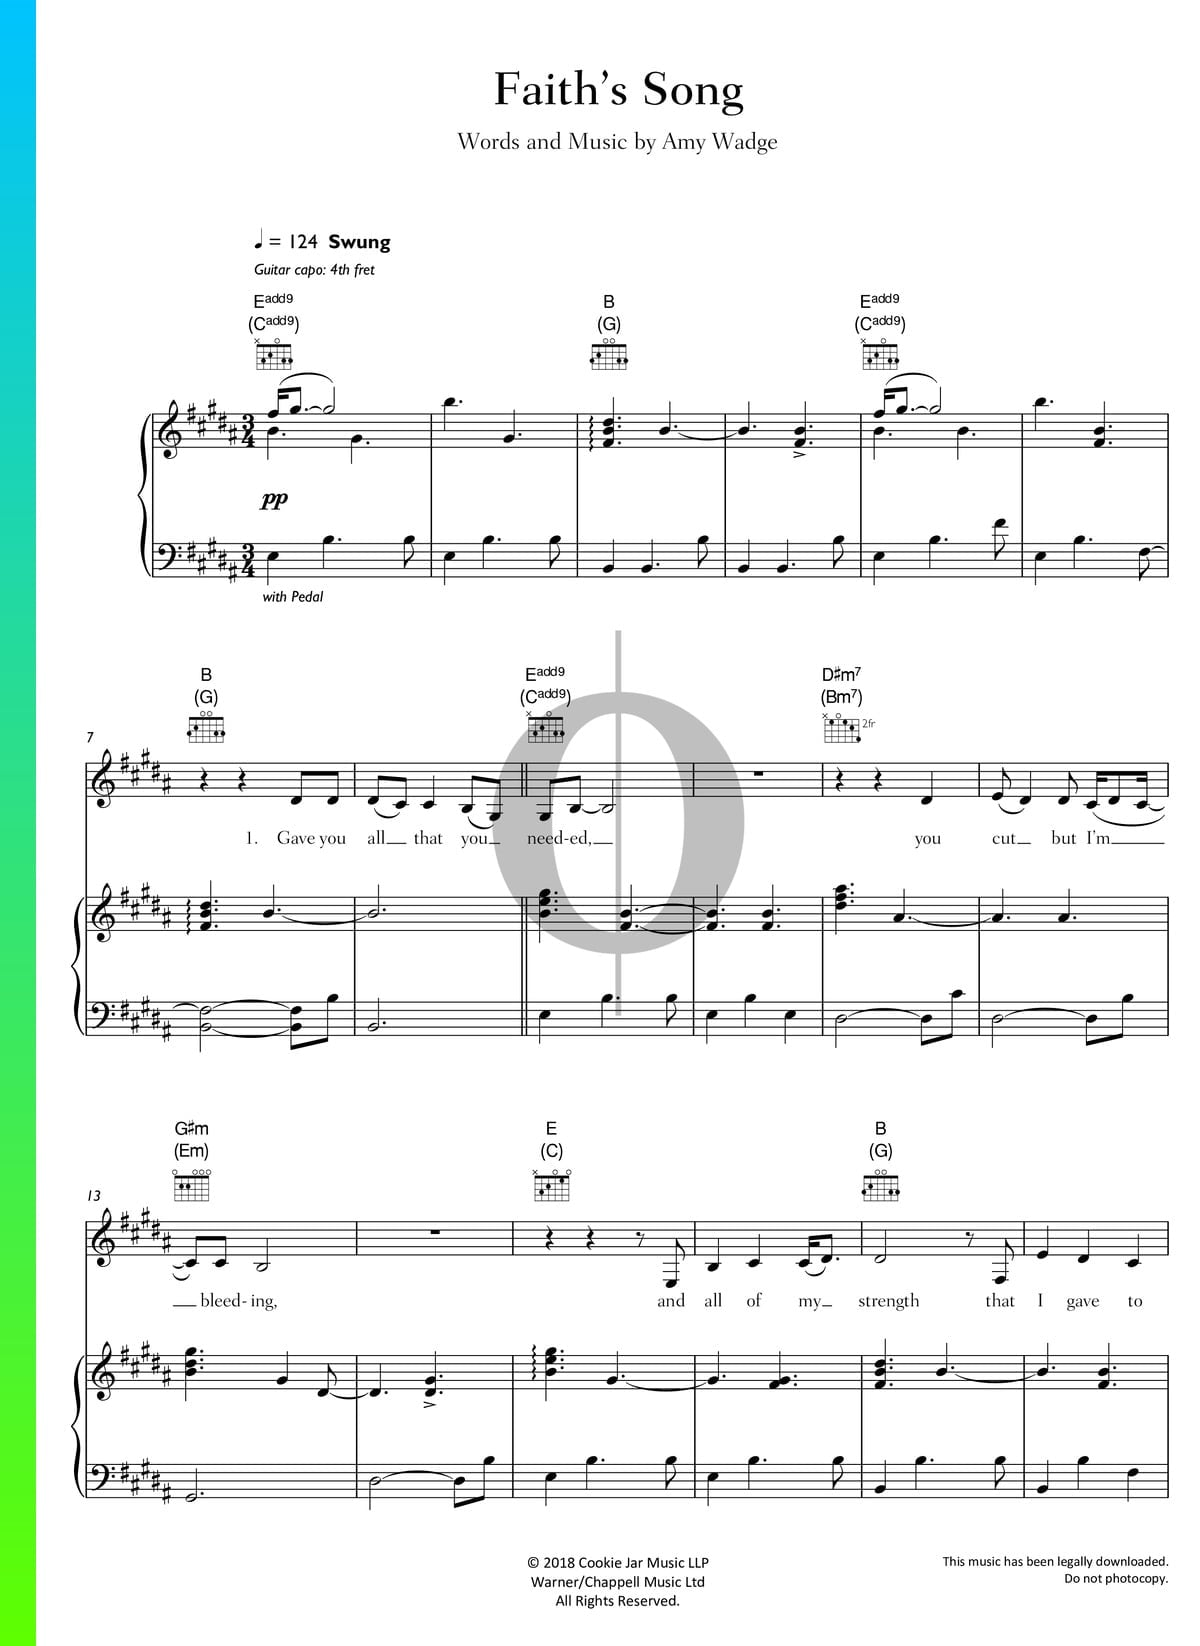 ▷ Faith's Song Sheet Music (Piano, Voice, Guitar) - PDF